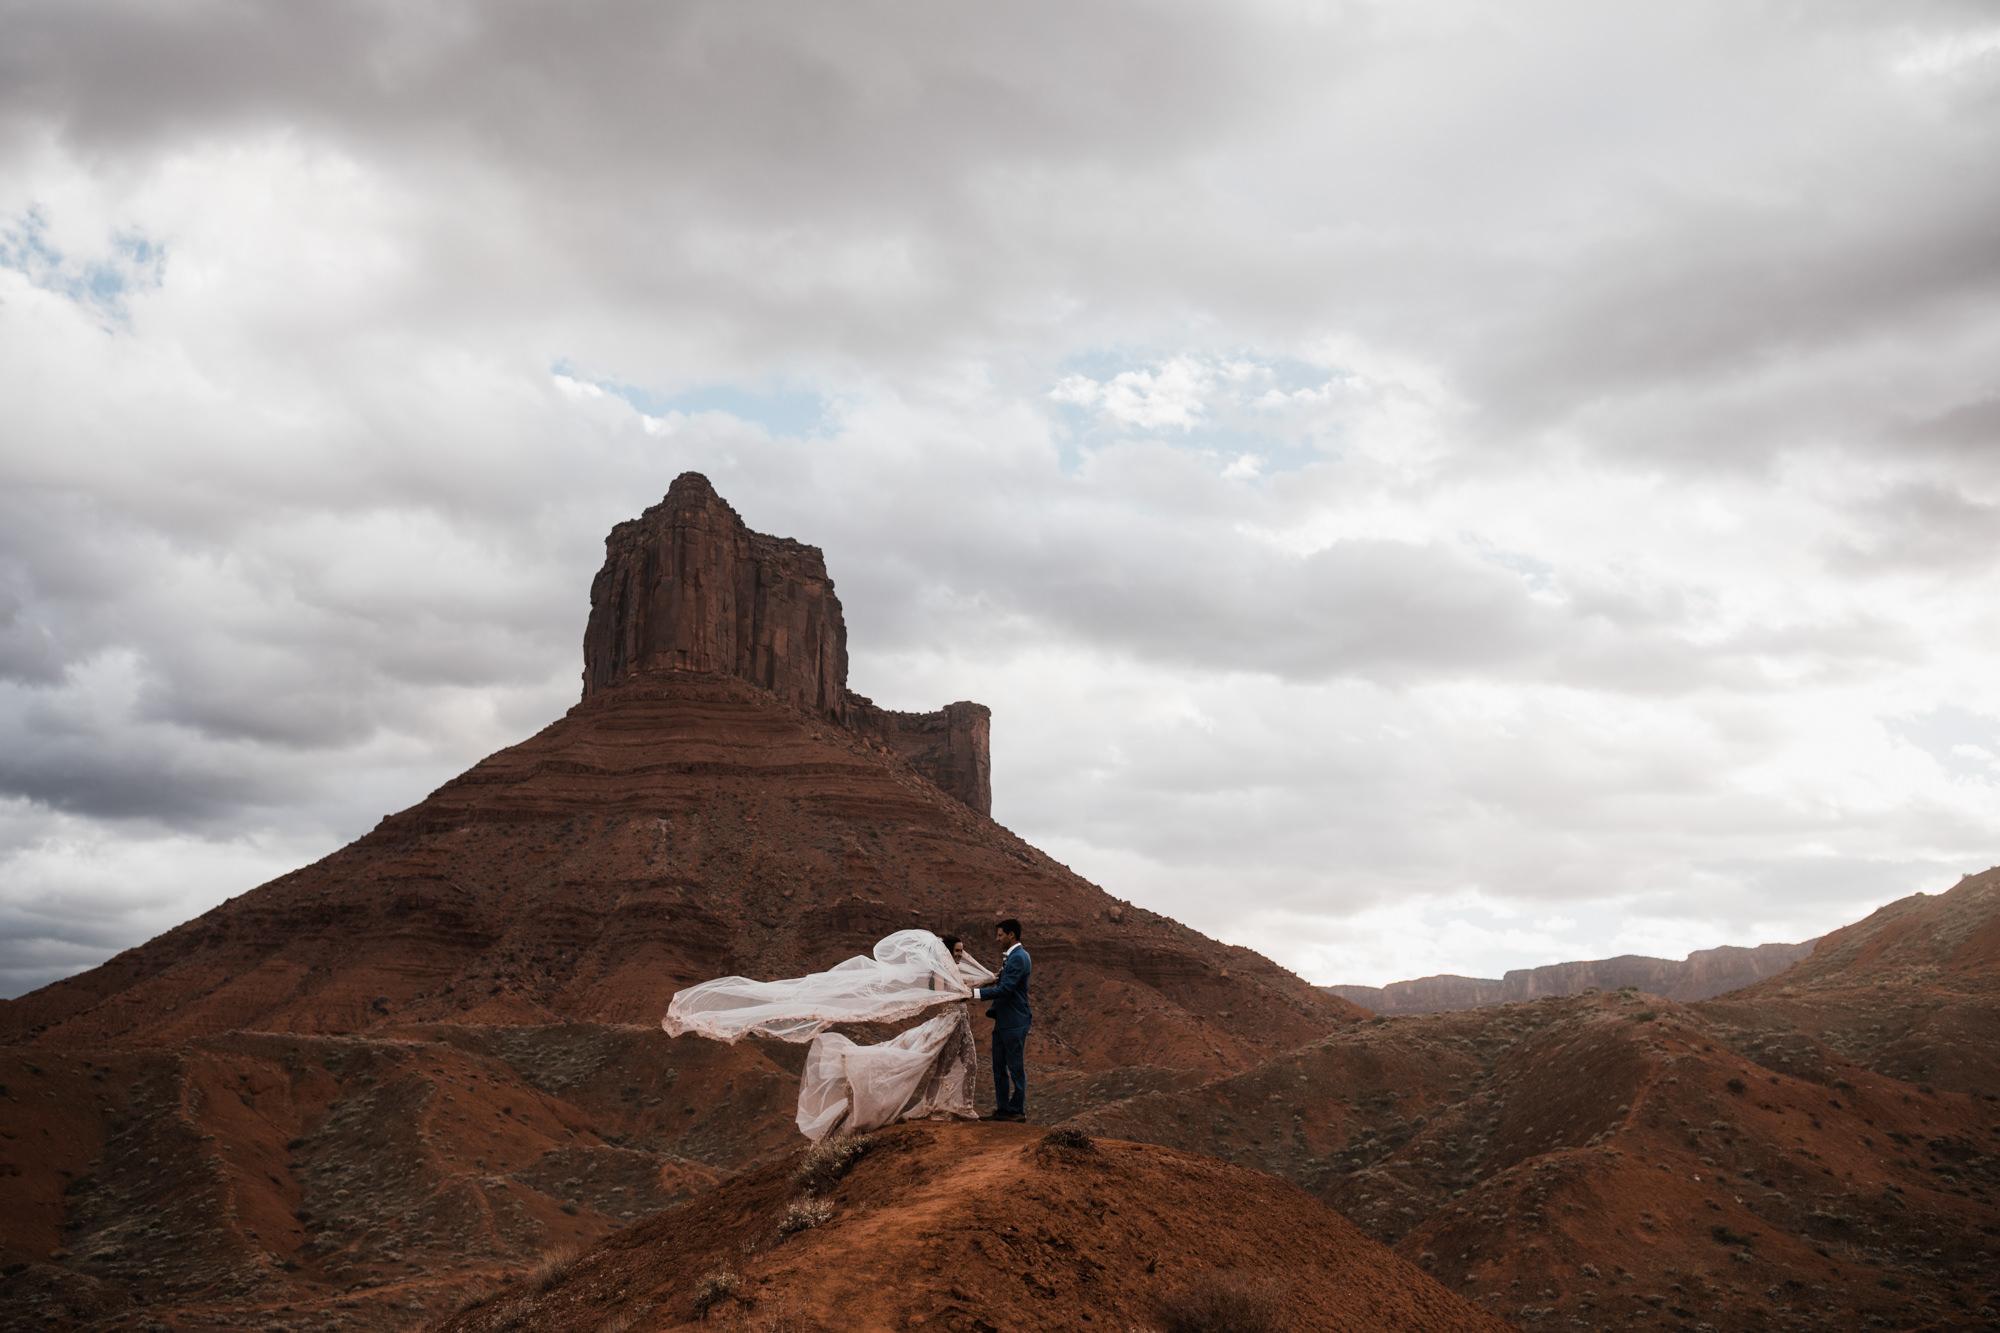 moab, utah spacenet wedding day| destination adventure wedding photographers | the hearnes adventure photography | www.thehearnes.com